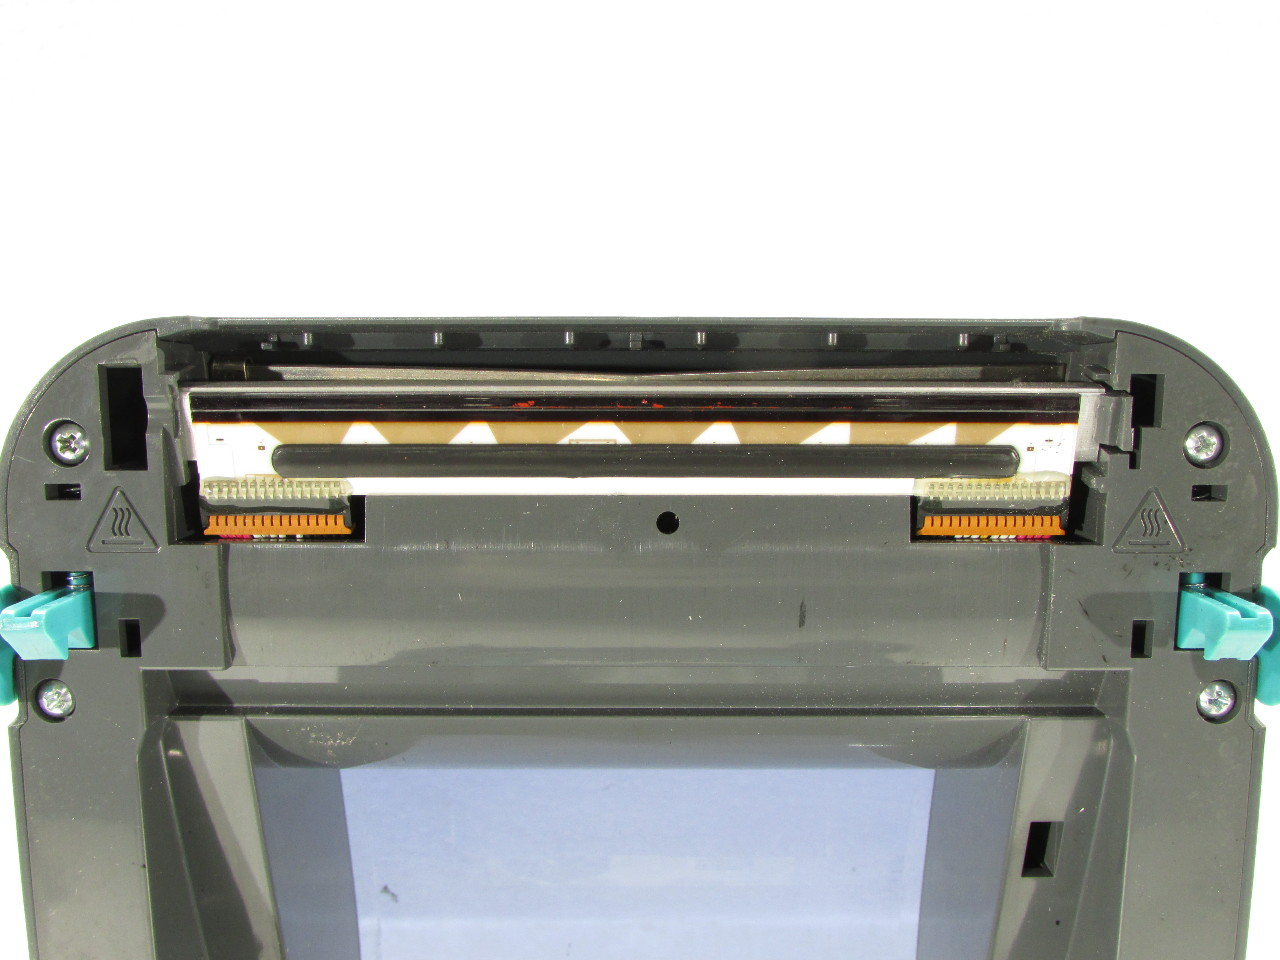 ZEBRA GK420d DIRECT THERMAL PRINTER #2 | Premier Equipment ...